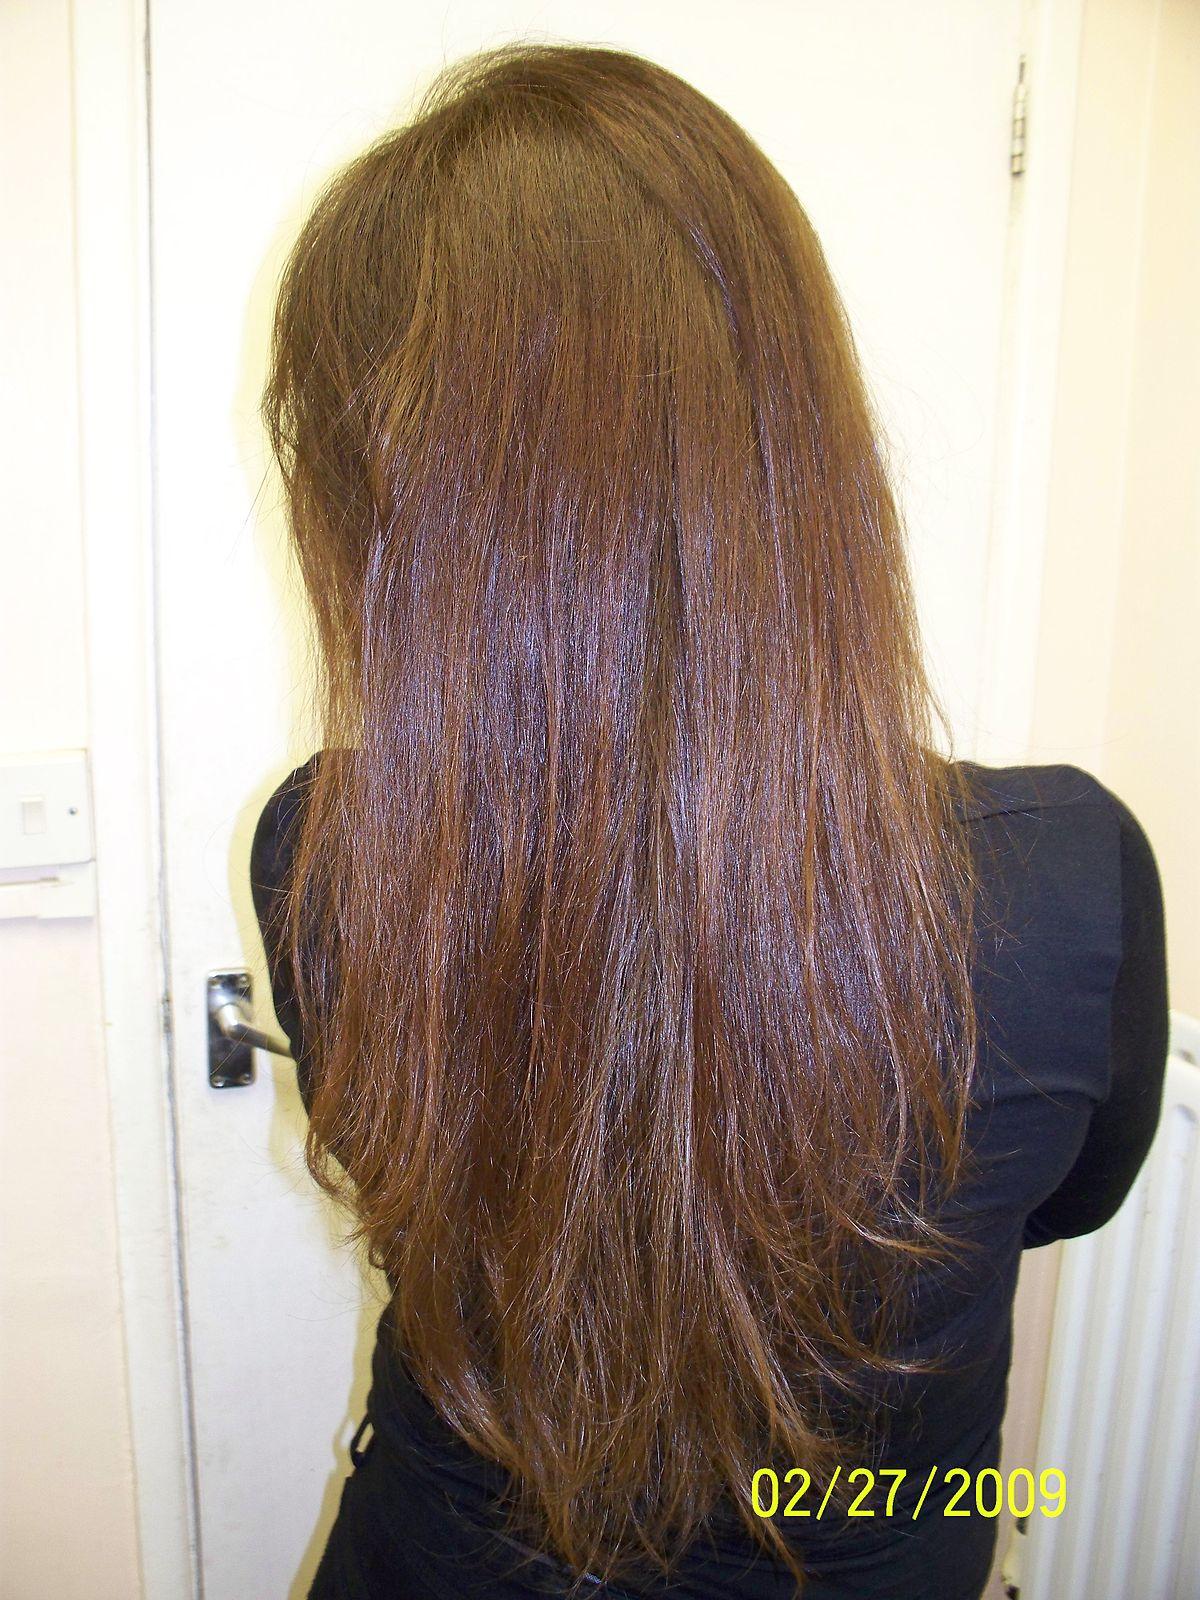 Hair  Simple English Wikipedia the free encyclopedia